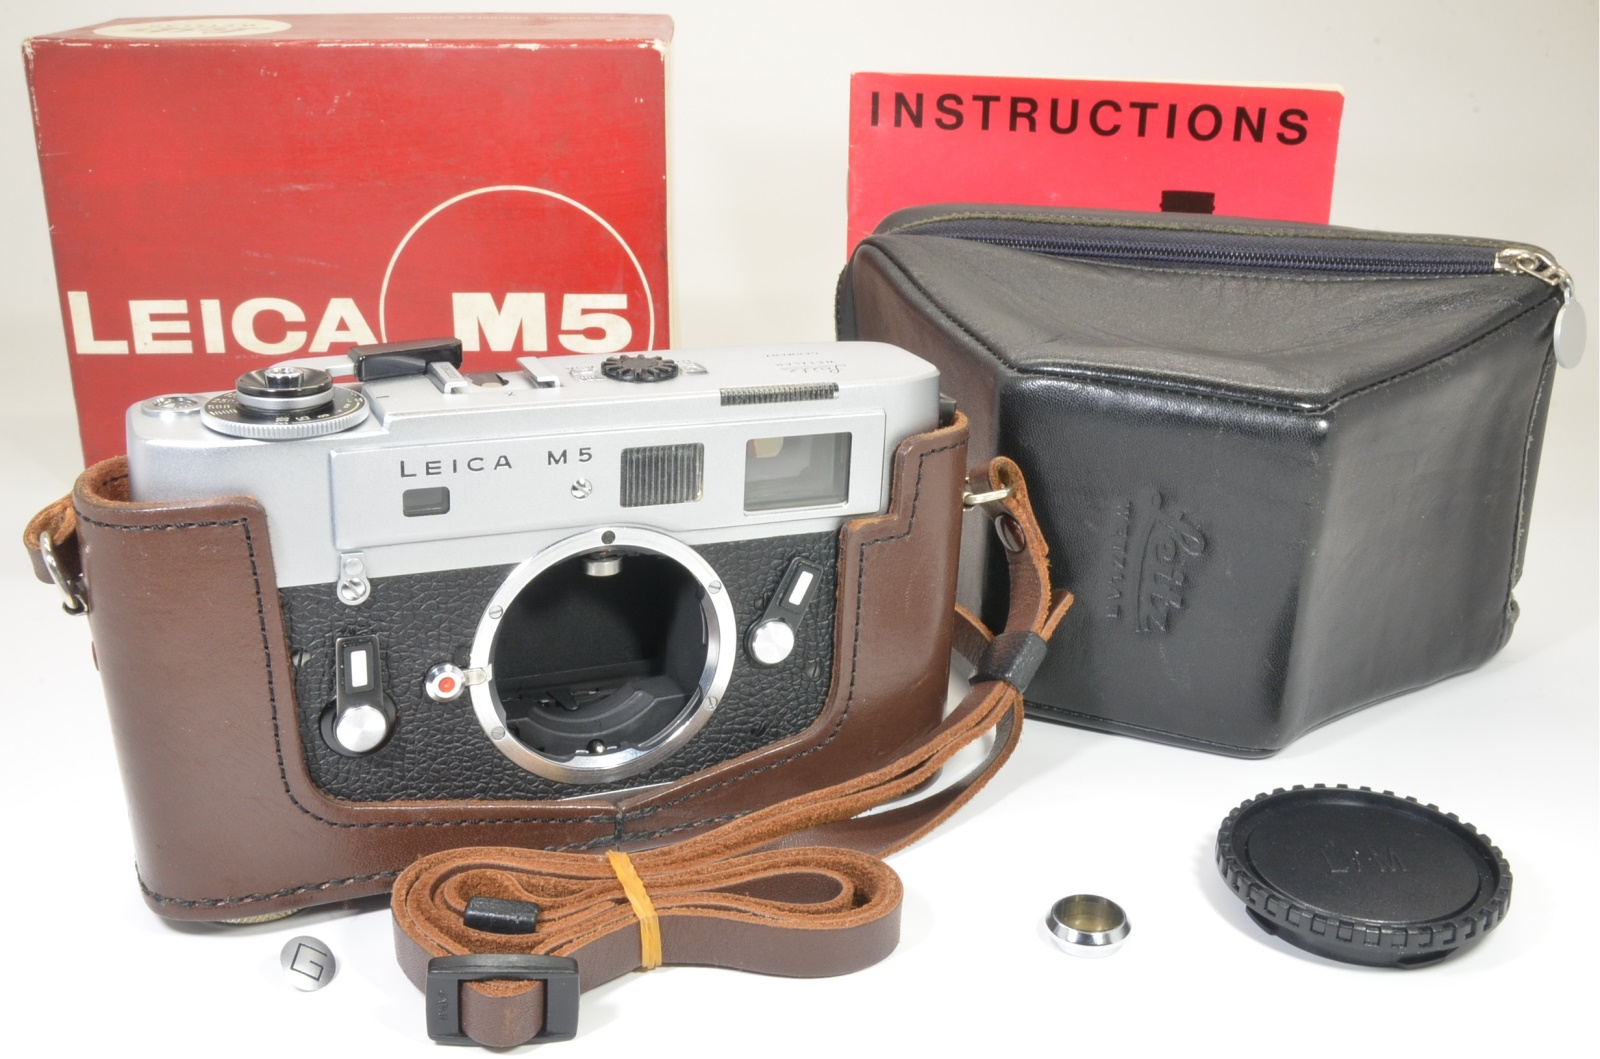 leica m5 silver chrome 3 lug s/n 1362203 year 1973 shooting tested